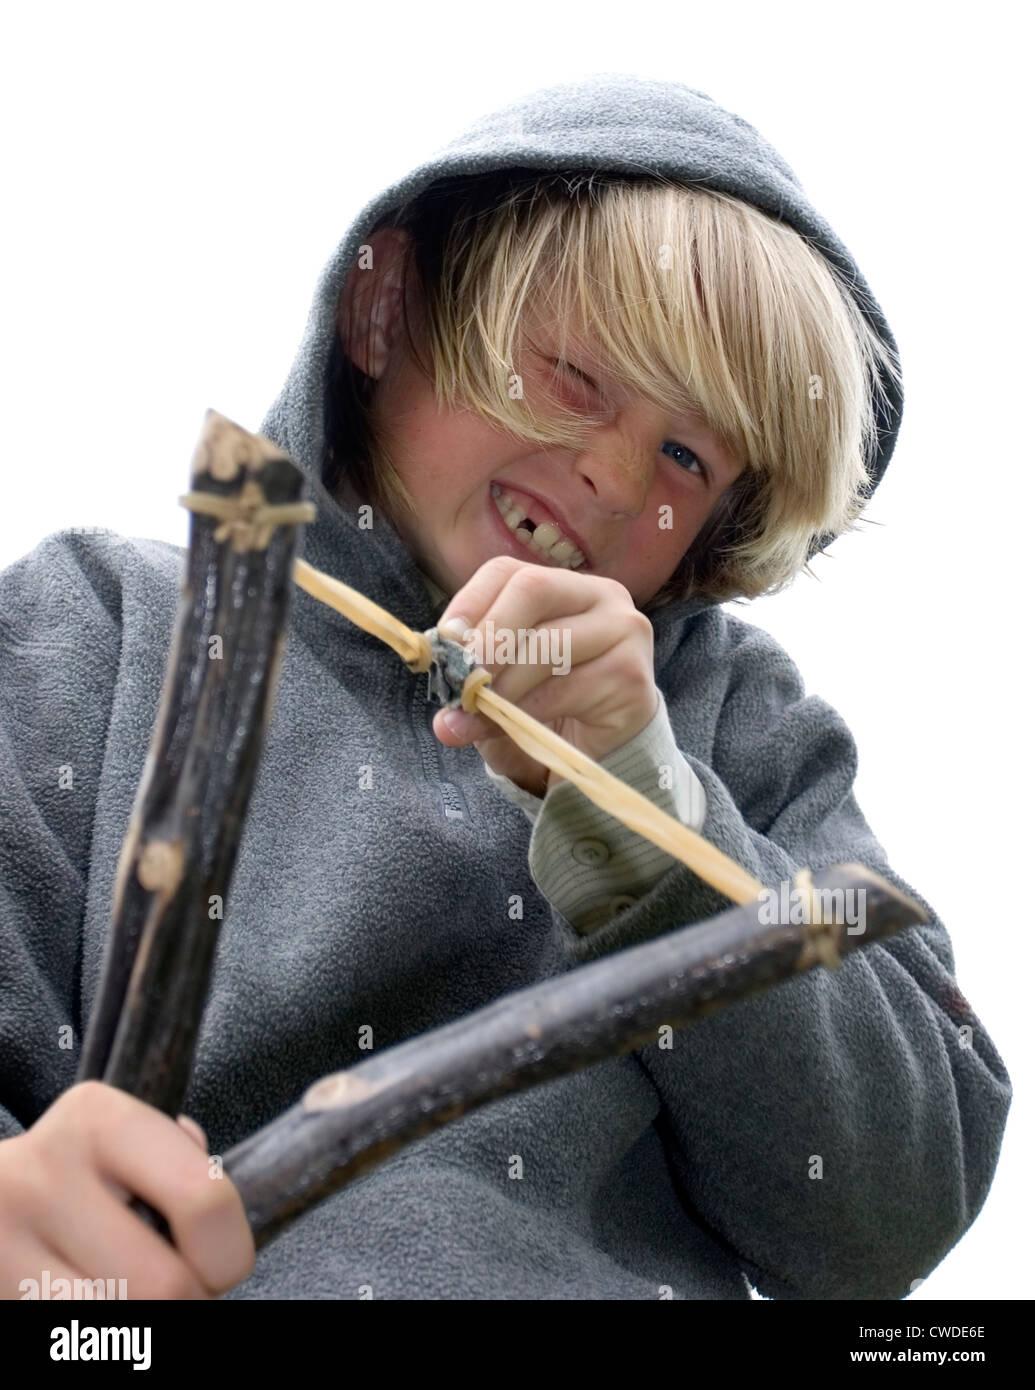 boy,slingshot - Stock Image